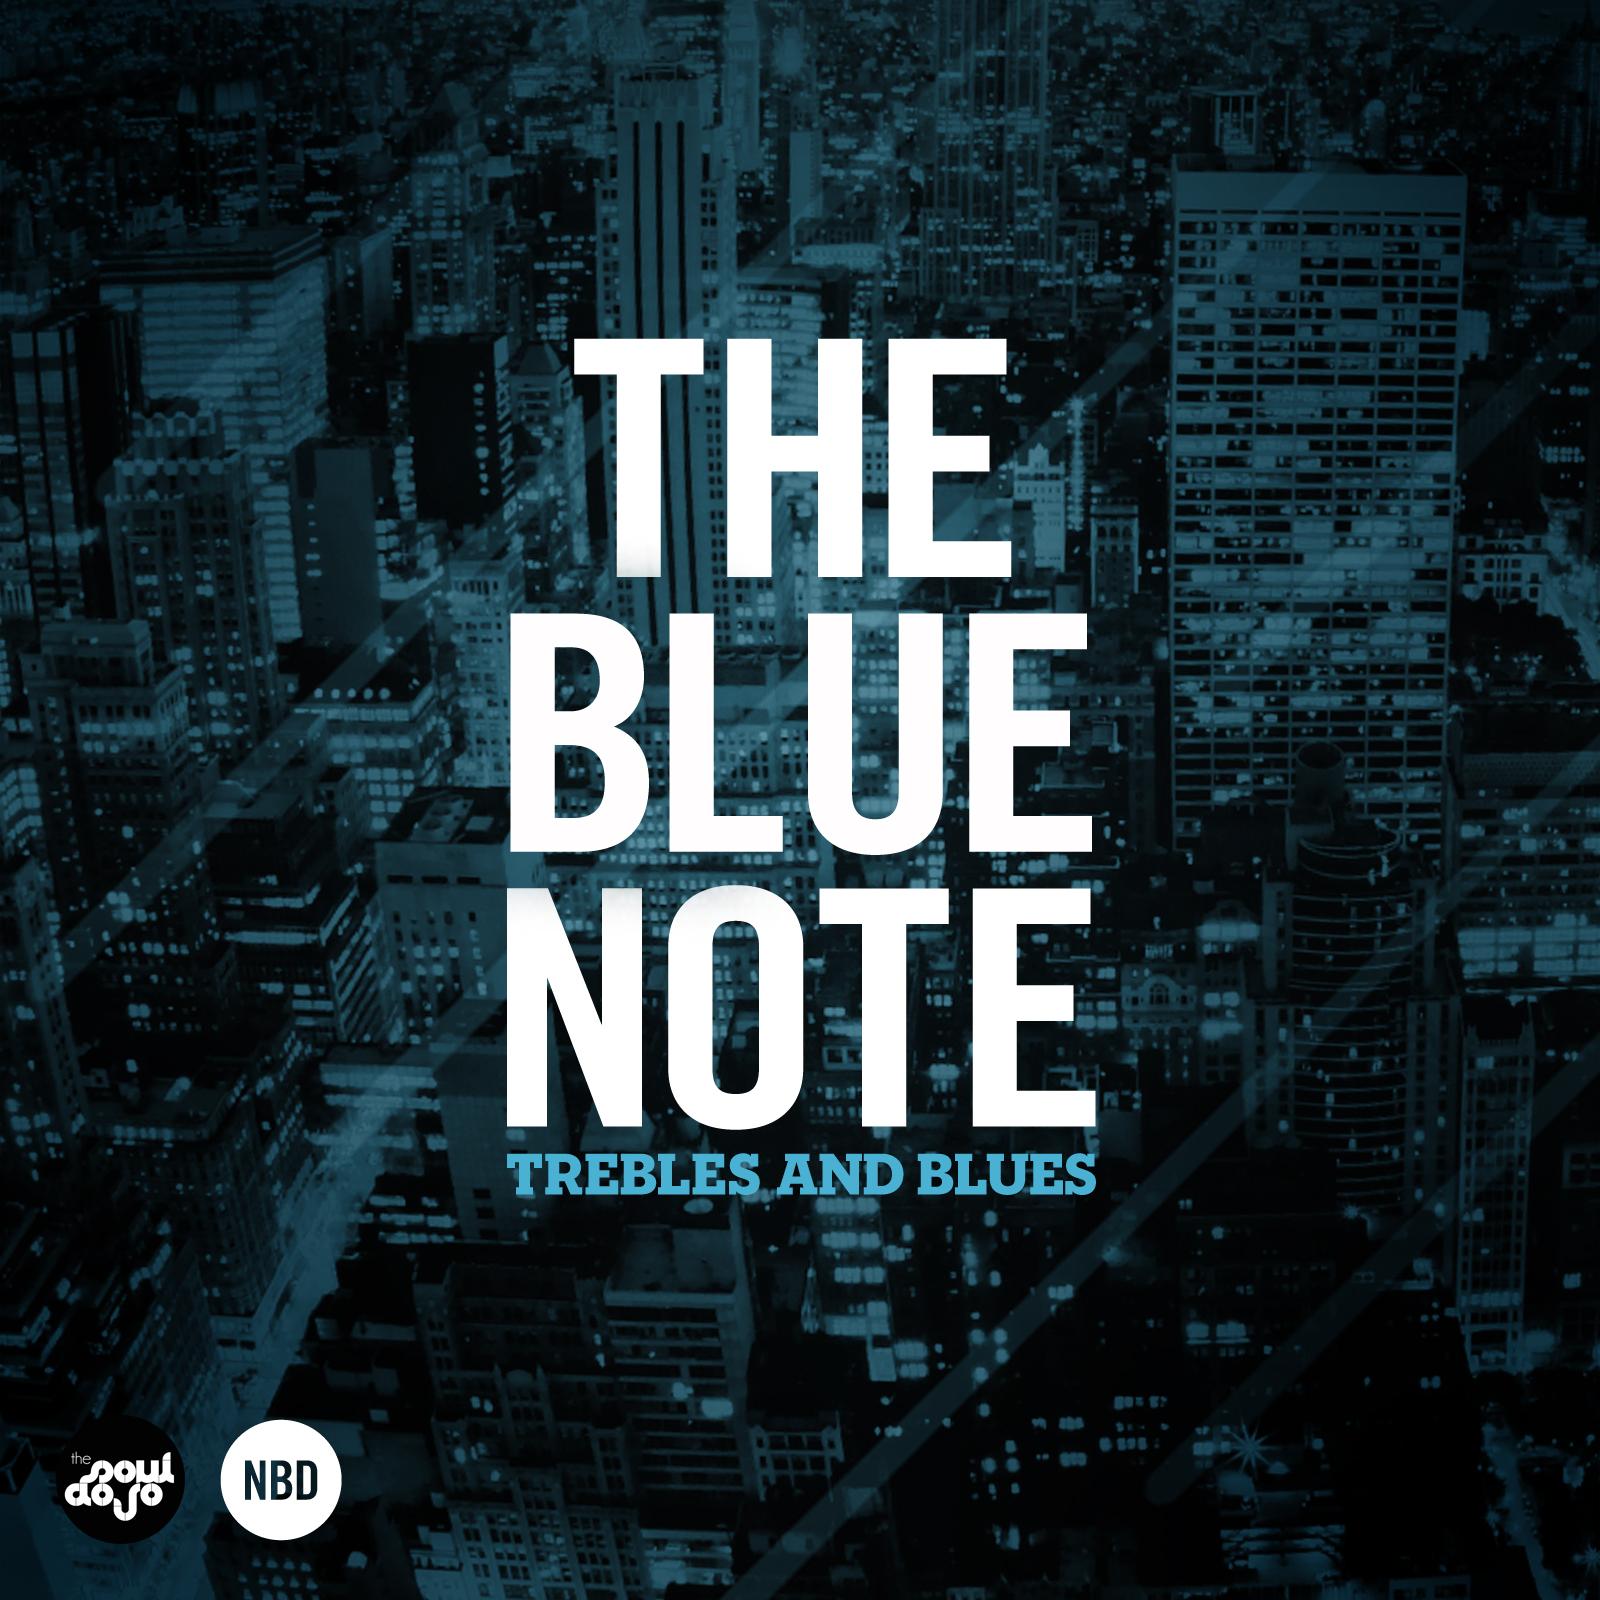 Album-Artwork-The-Blue-Note.jpg